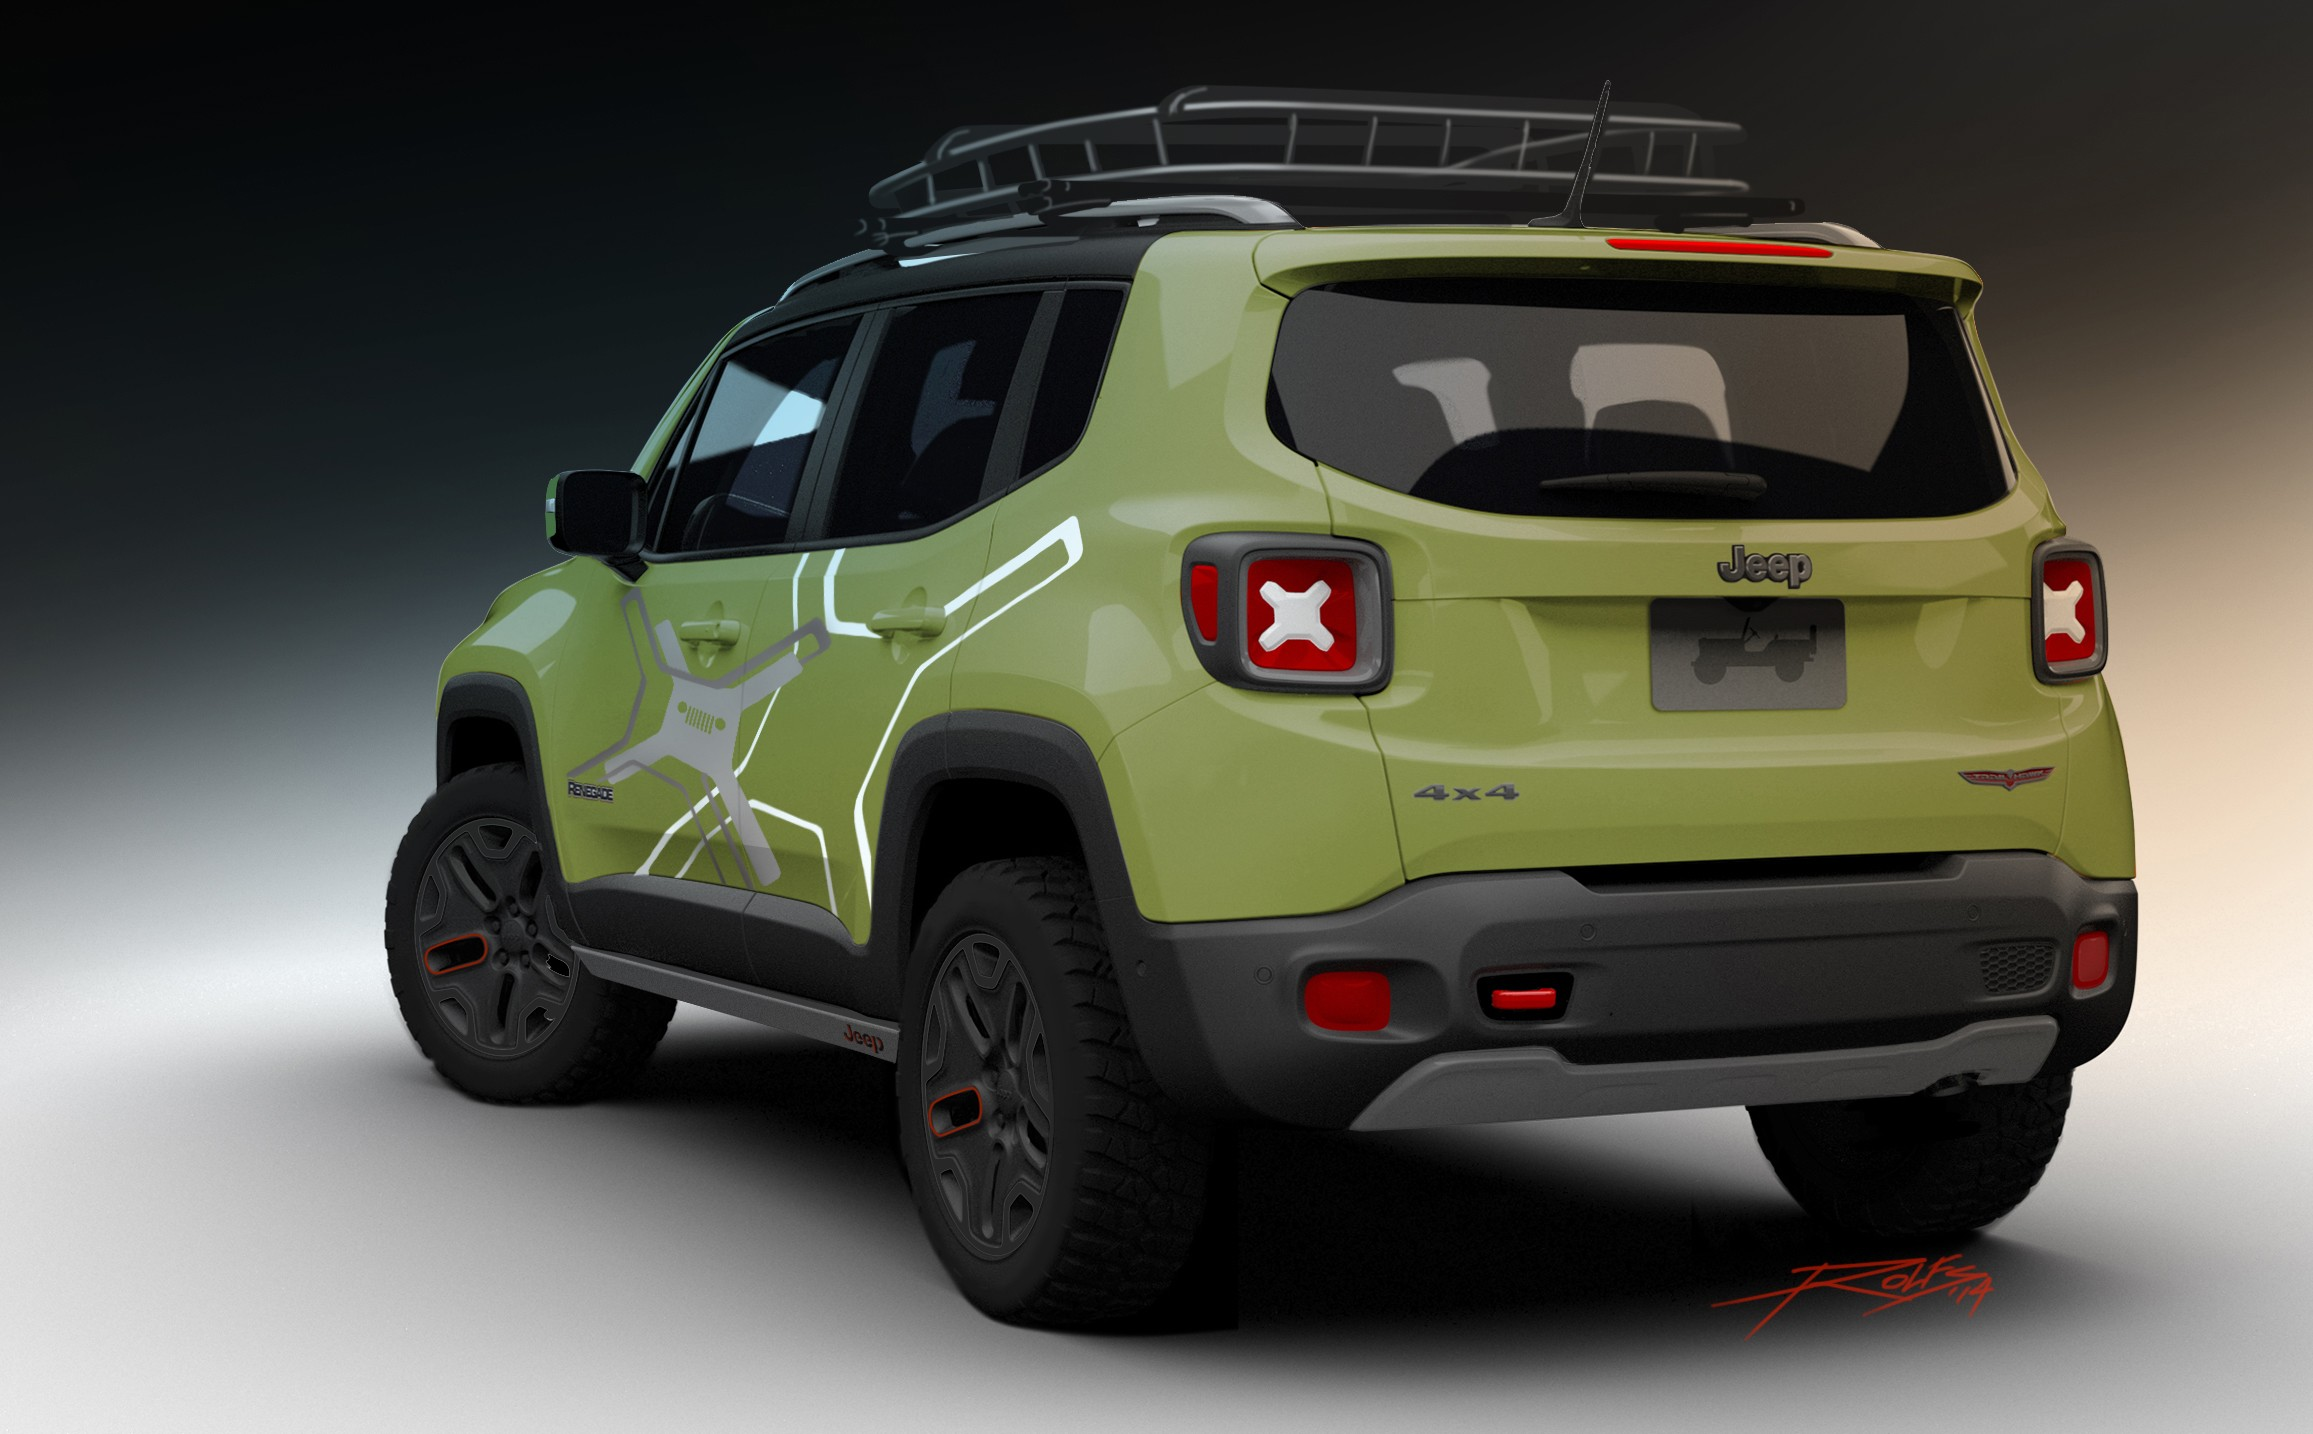 Jeep Renegade Trailhawk Tuning >> 2015 Jeep Renegade Receives Mopar Goodies for 2015 Detroit Auto Show - autoevolution